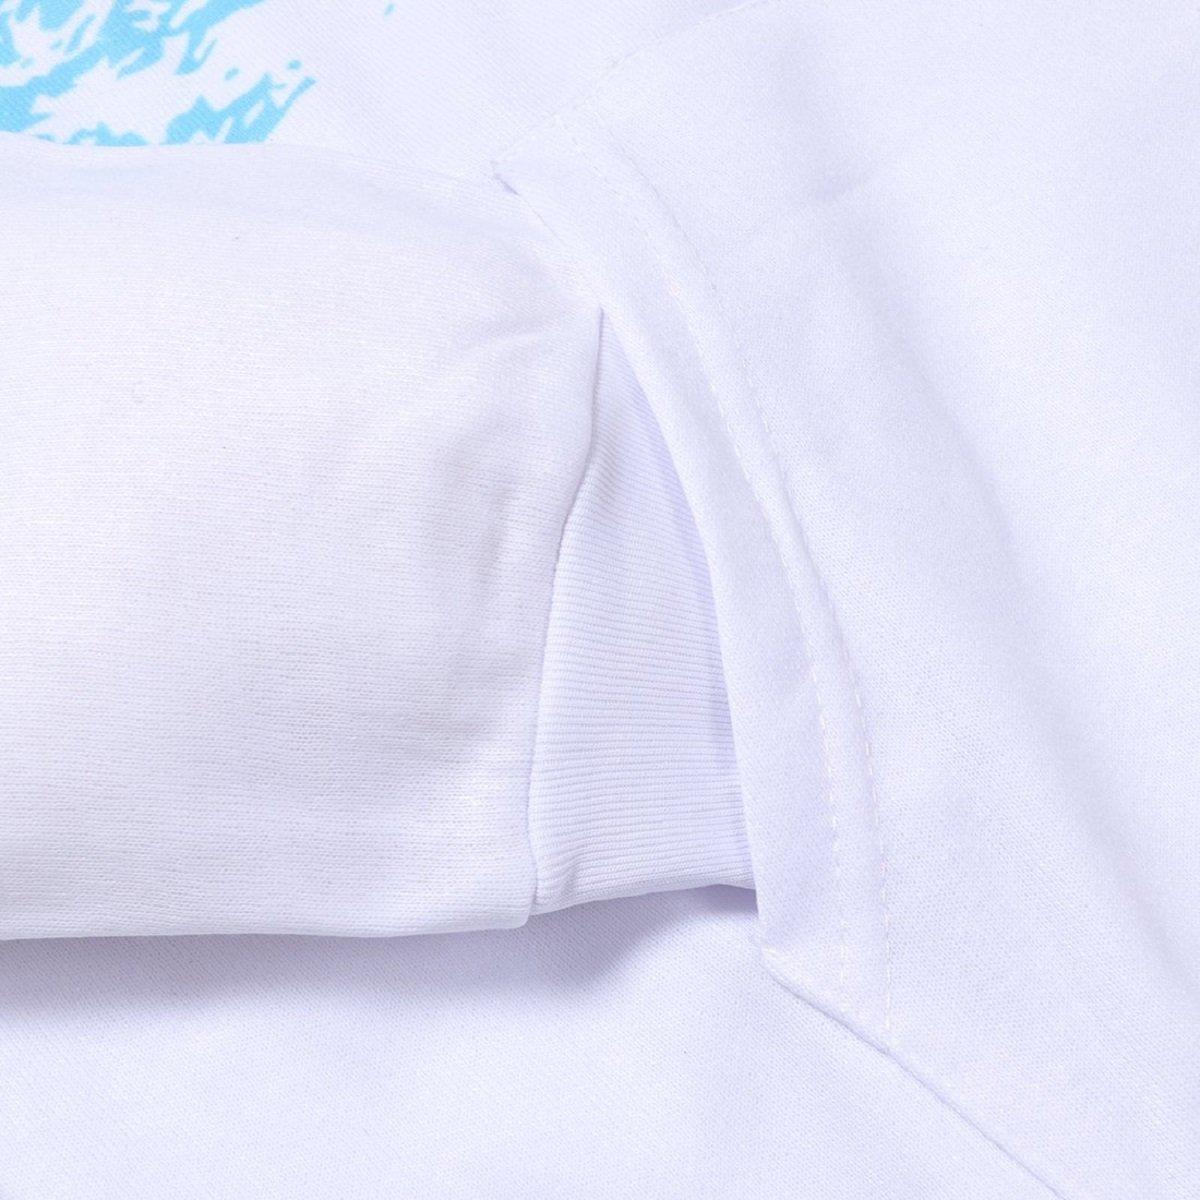 Goodstoworld Unisex 3D Zip Hoodie Novelty Printed Sweatshirt with Big Pockets S-2XL